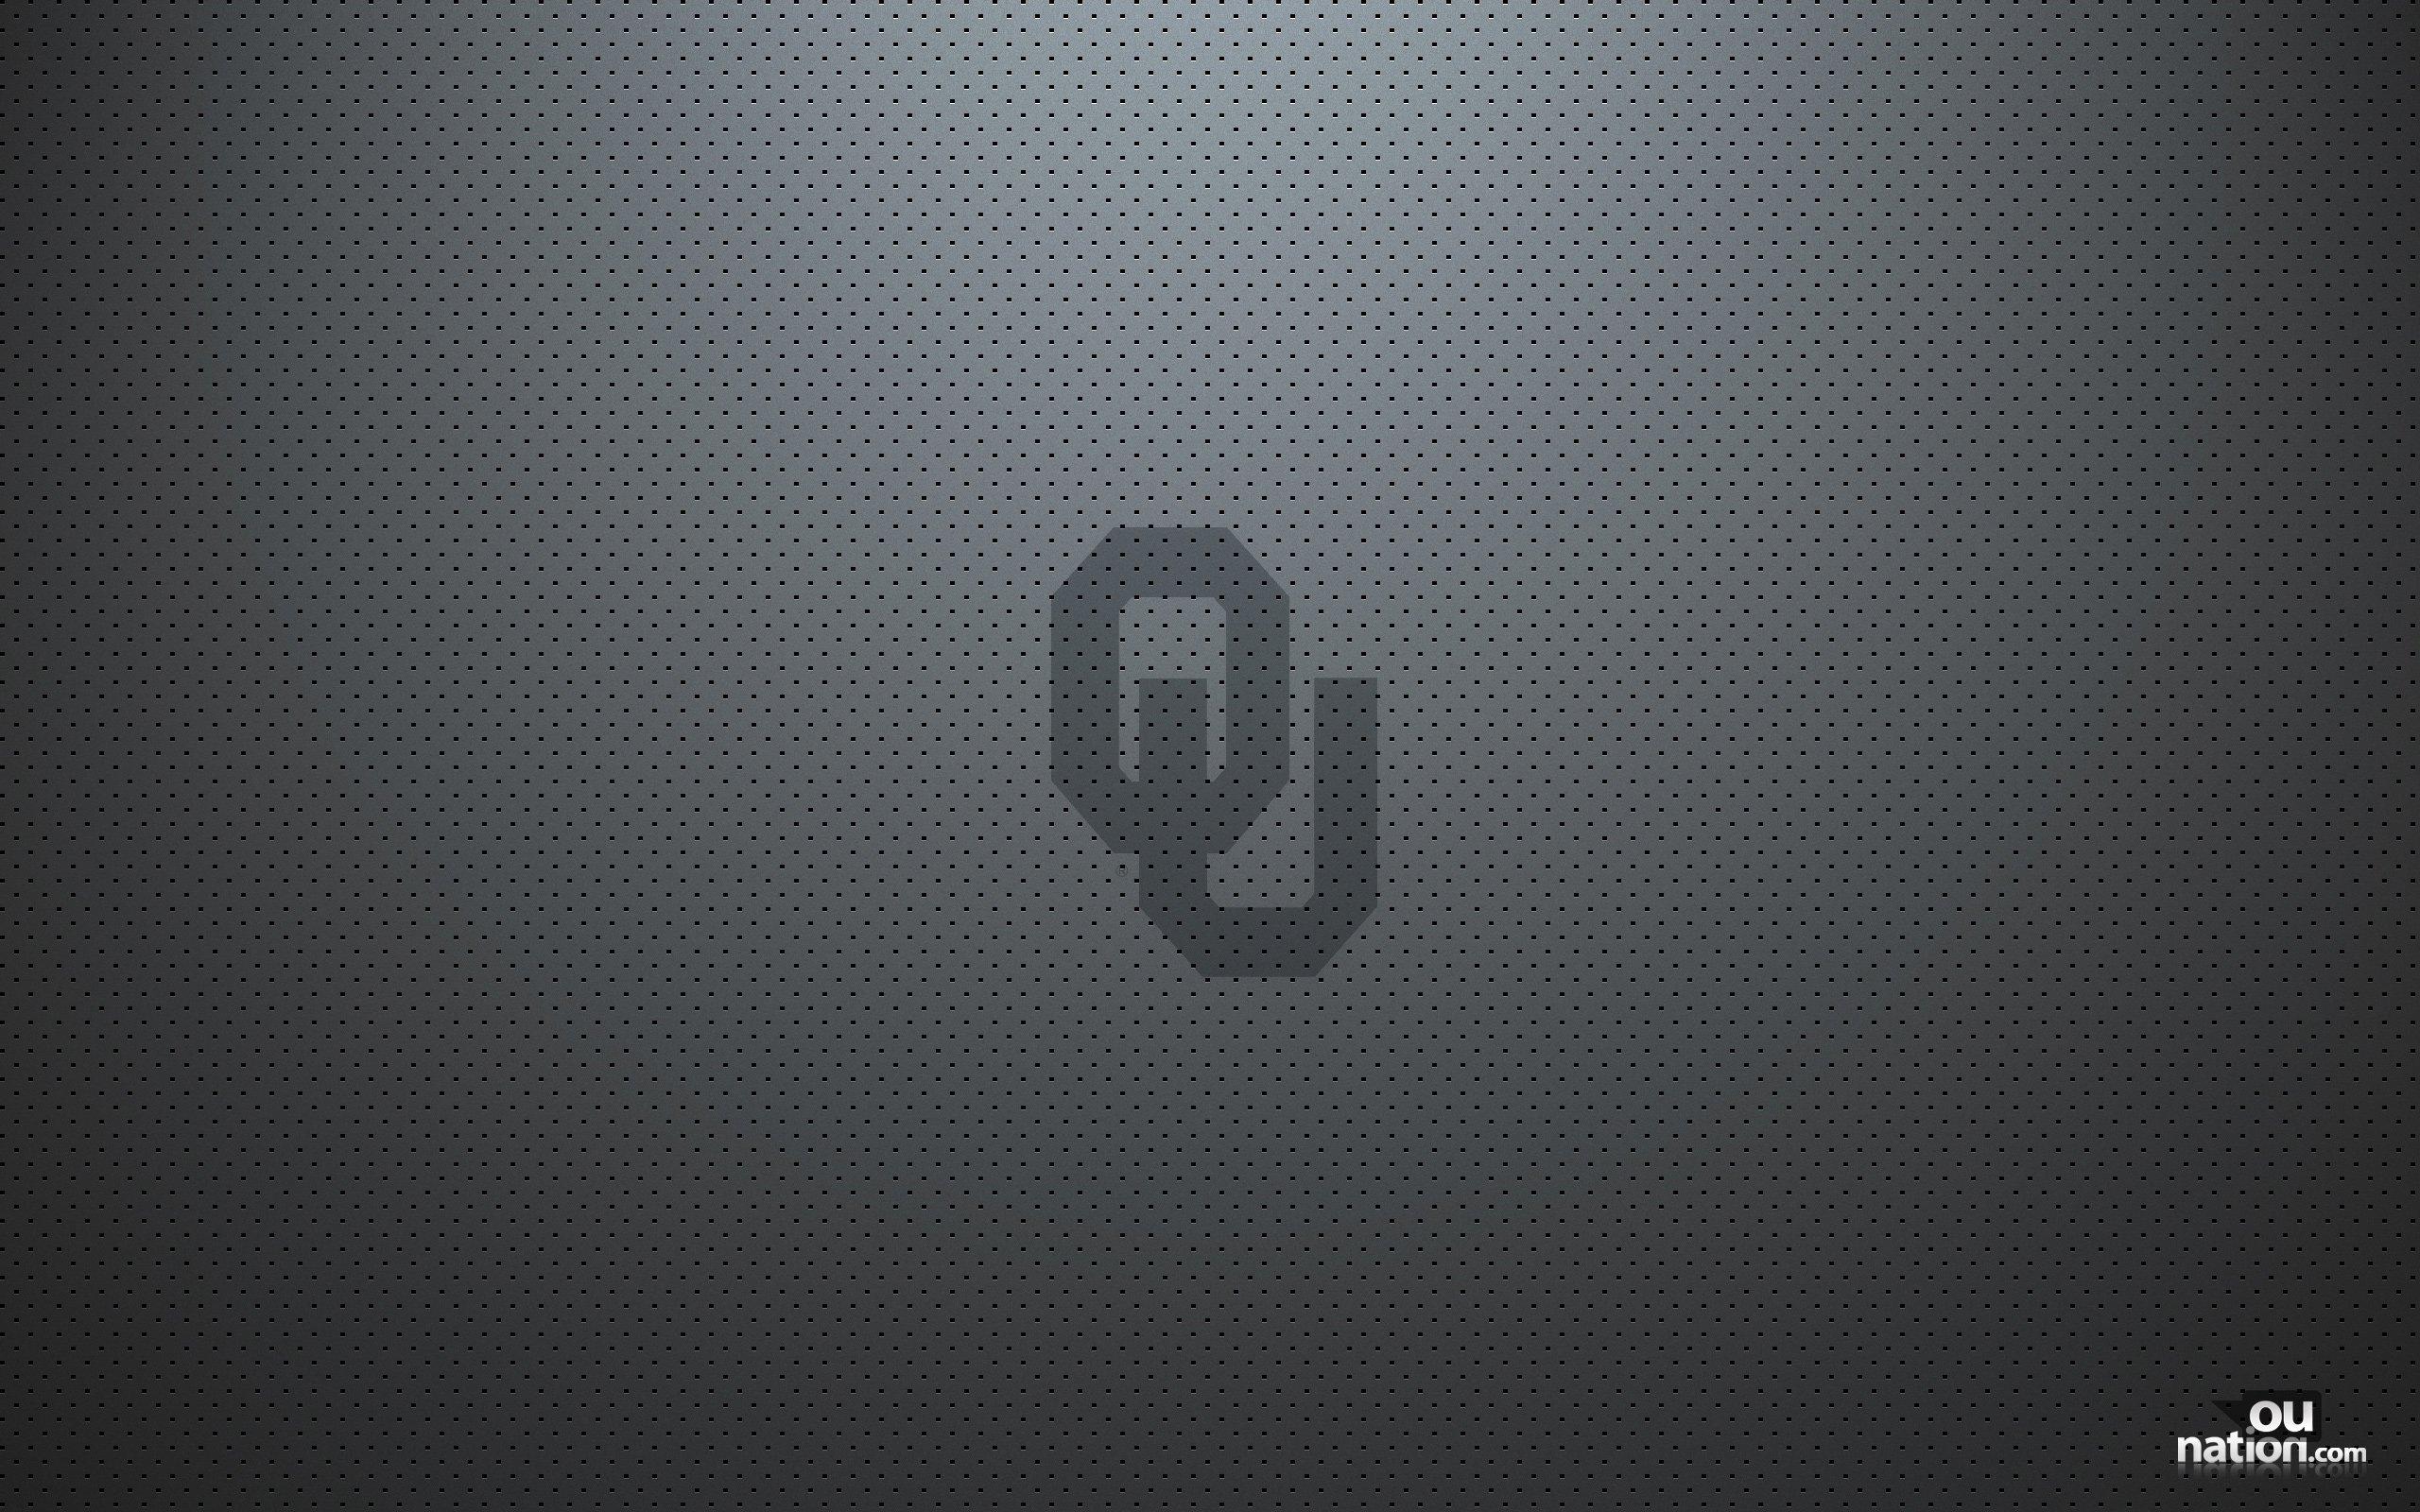 OKLAHOMA SOONERS college football wallpaper 2560x1600 594065 2560x1600